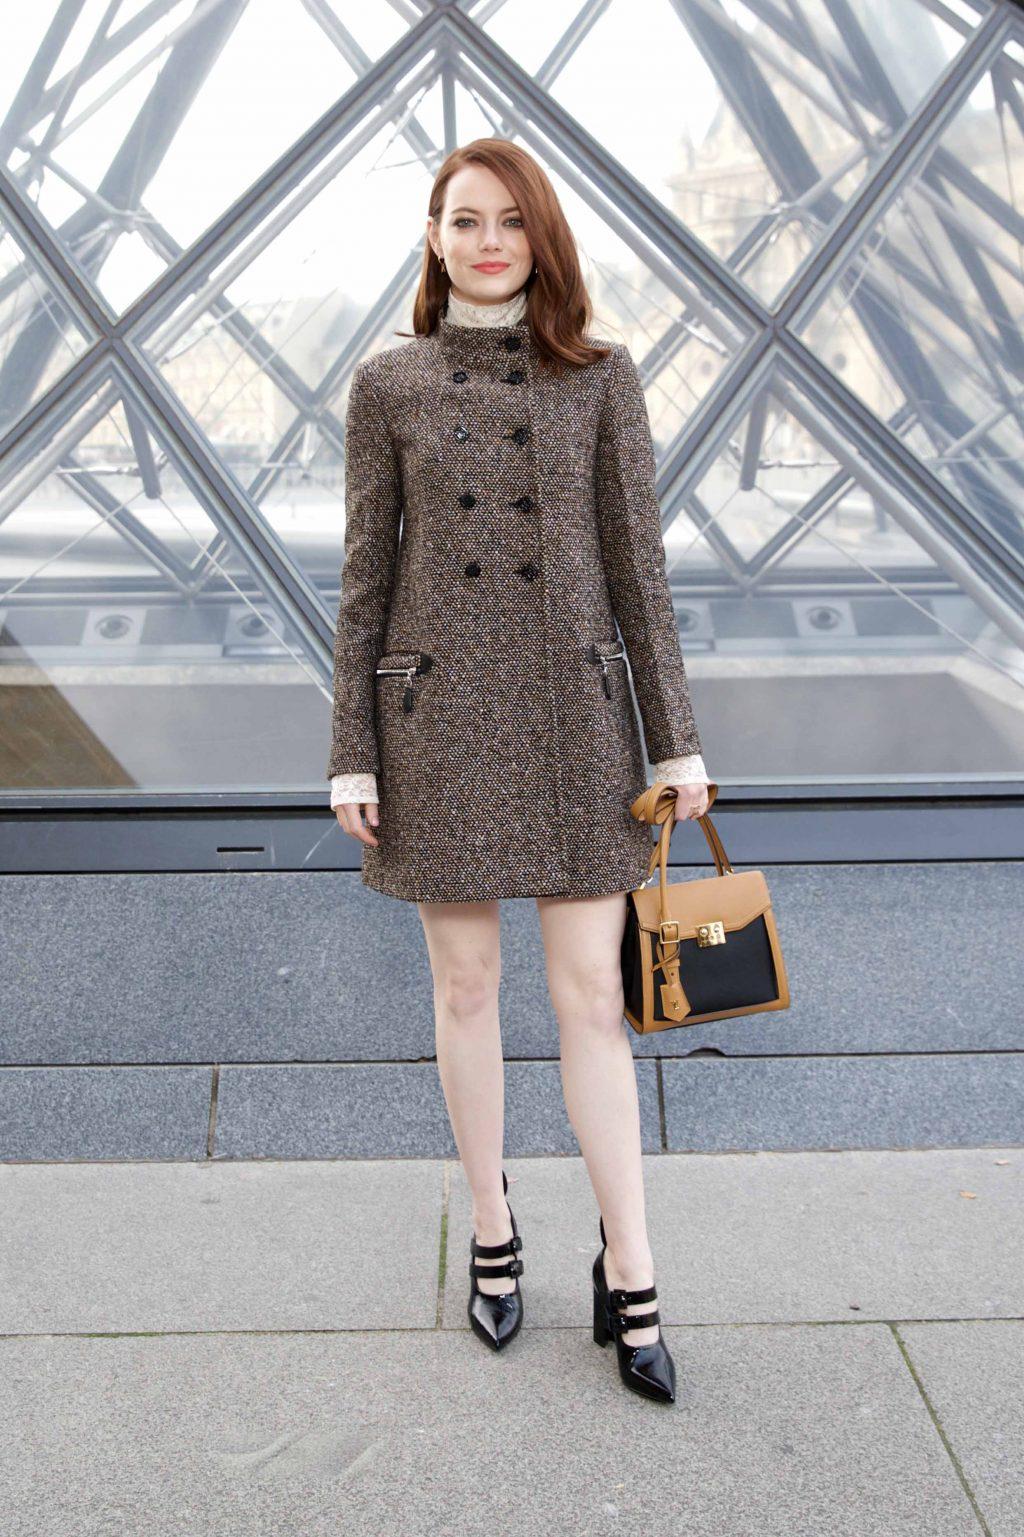 sao hàng ghế đầu tuần lễ thời trang paris show louis vuitton